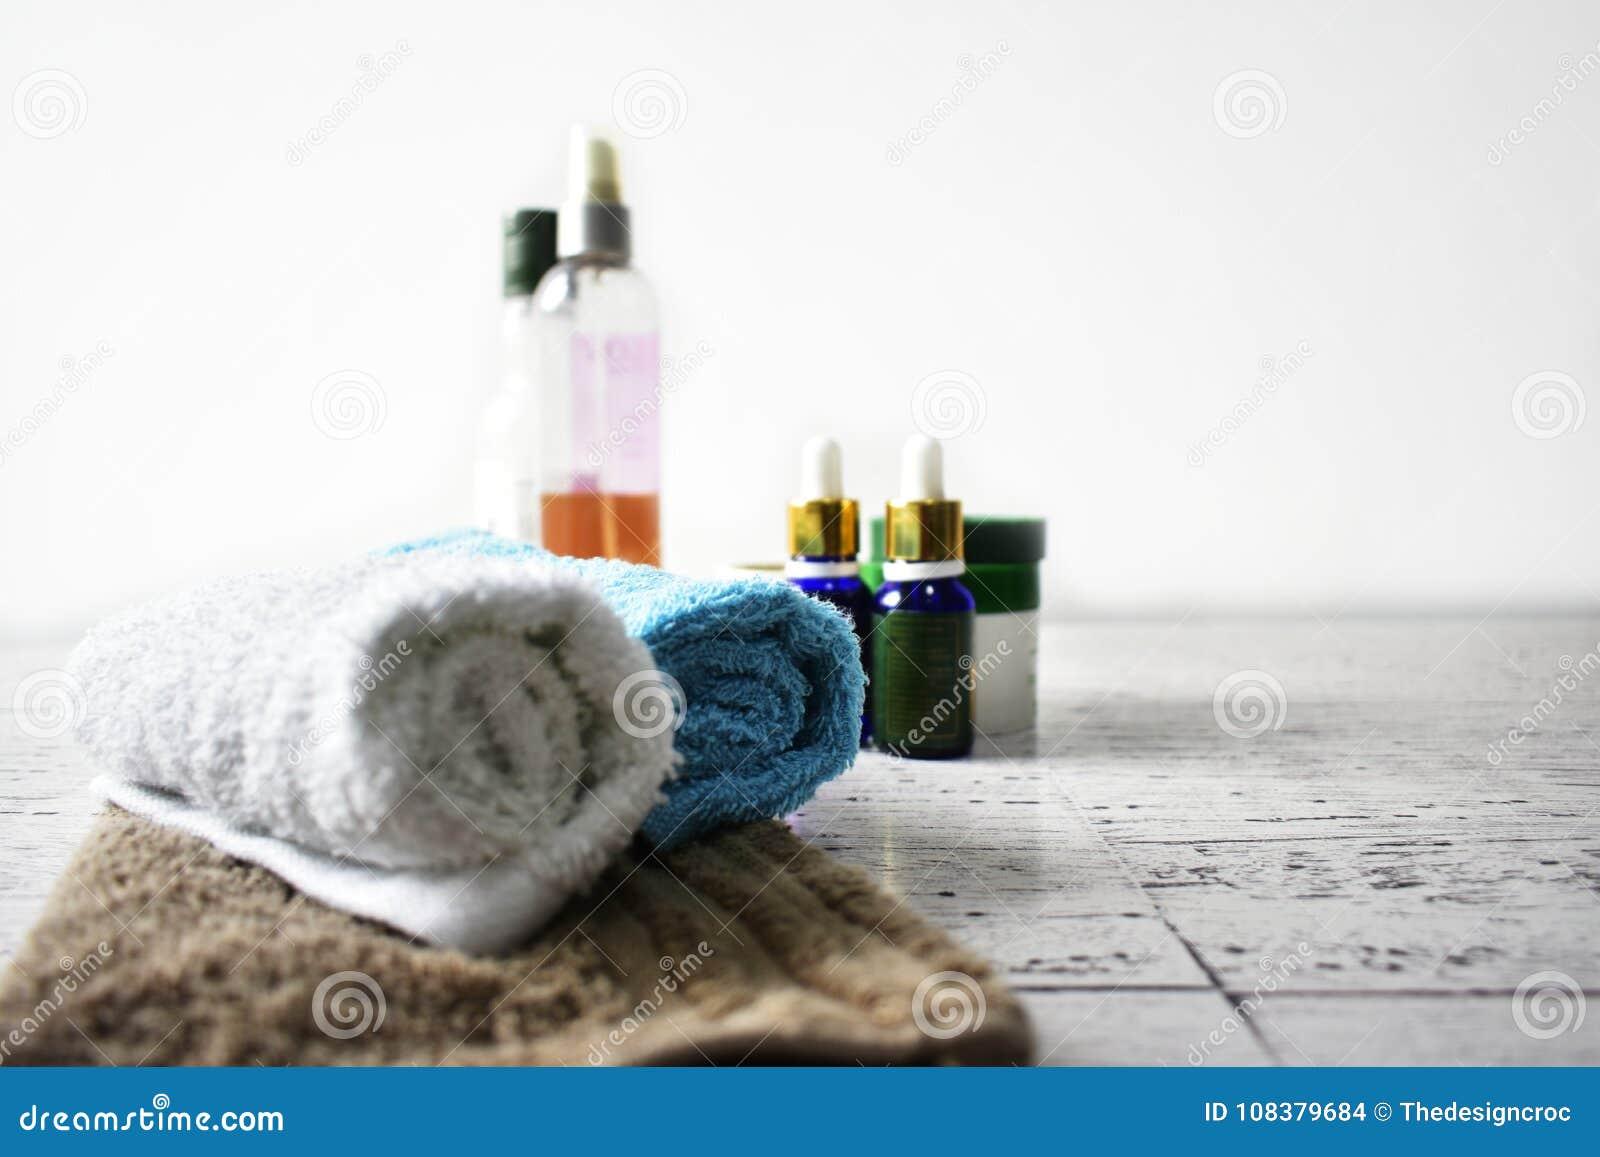 Spa concept towels oils body scrub pamper beauty wellness hygiene